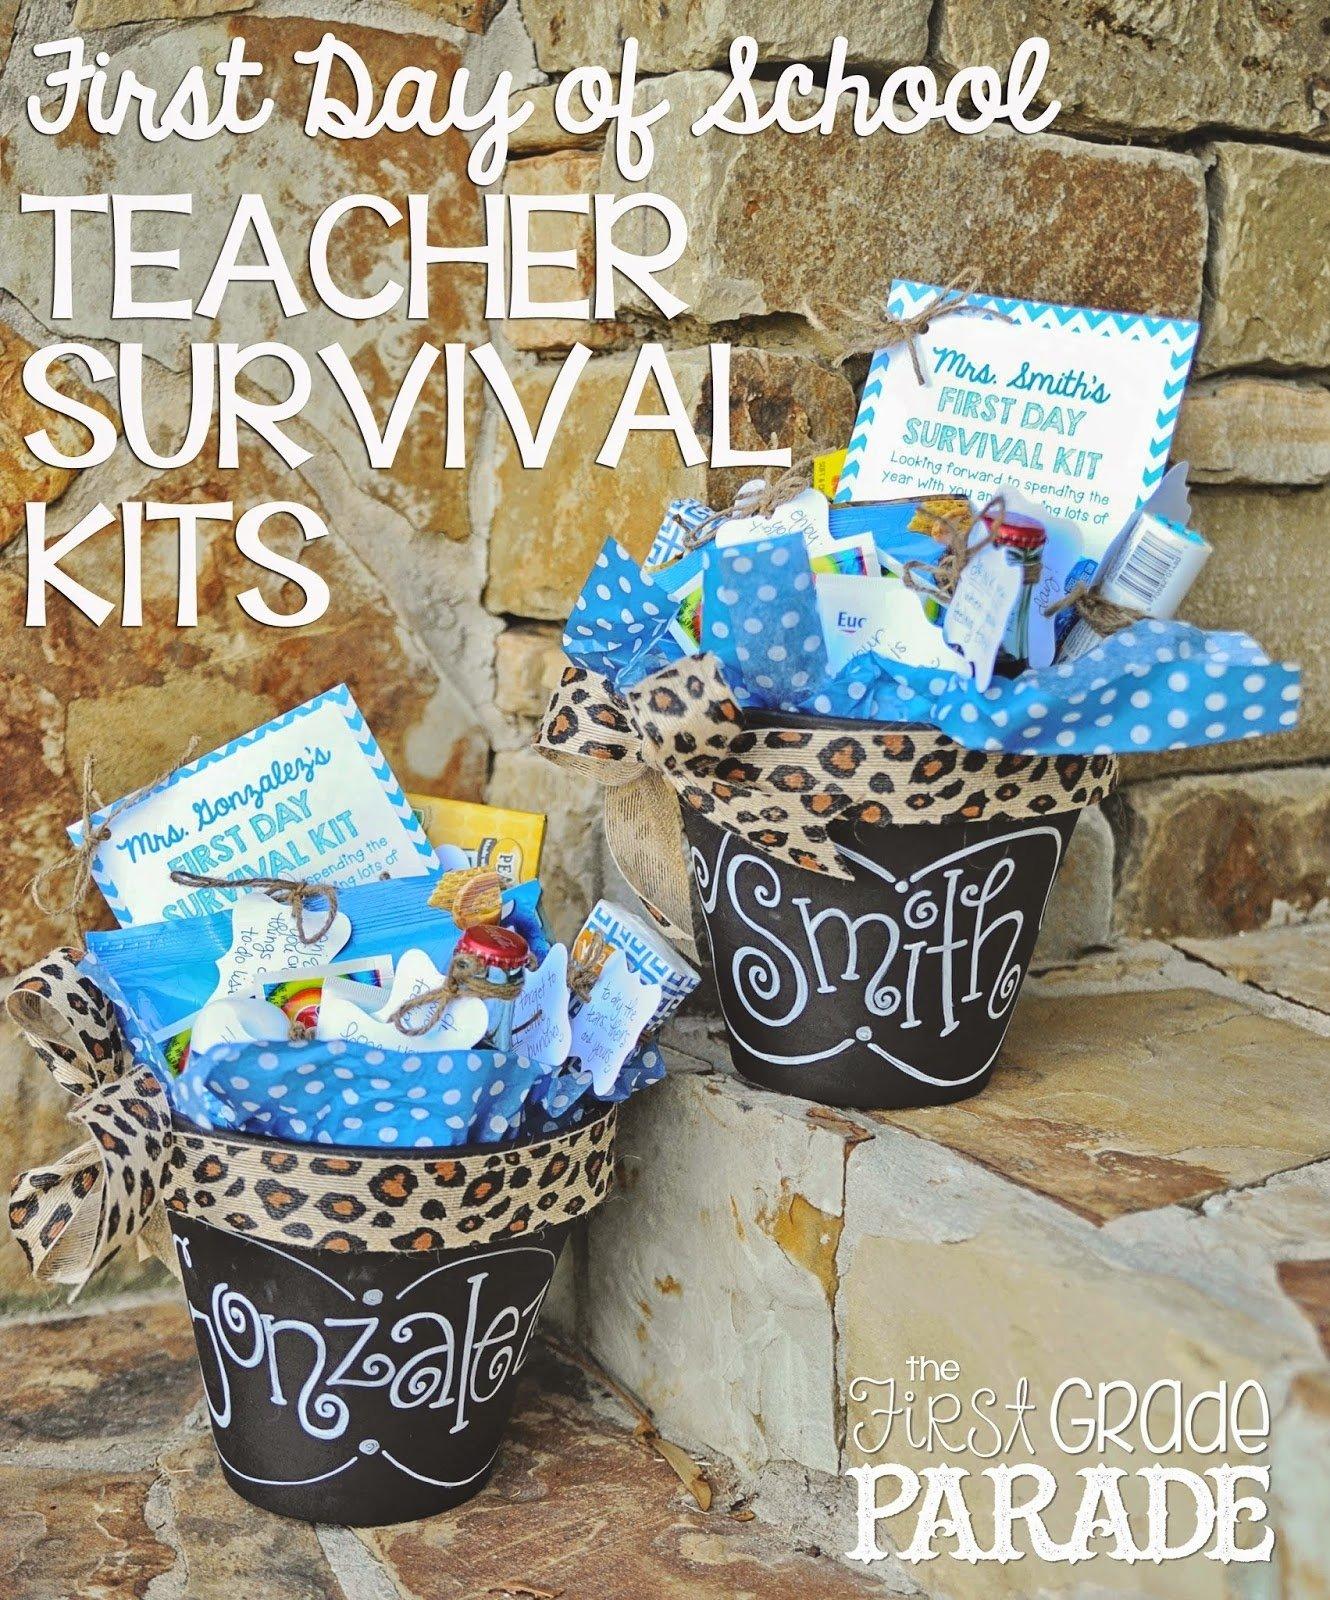 10 Beautiful Back To School Teacher Ideas 25 back to school teacher gift ideas 2020